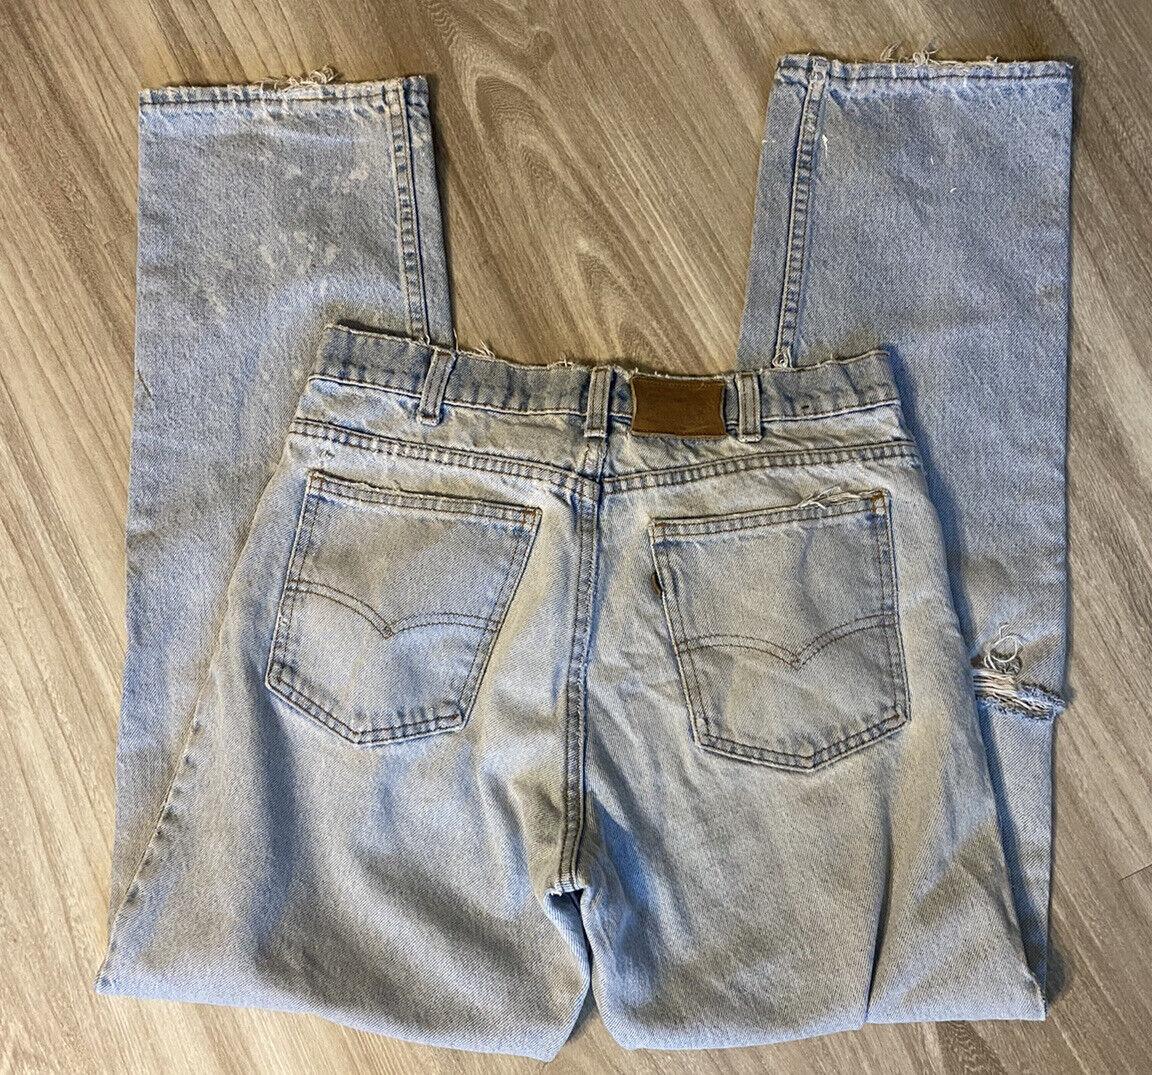 Vintage 90s Levis 540 32 X 32 Distressed Worn Jea… - image 8